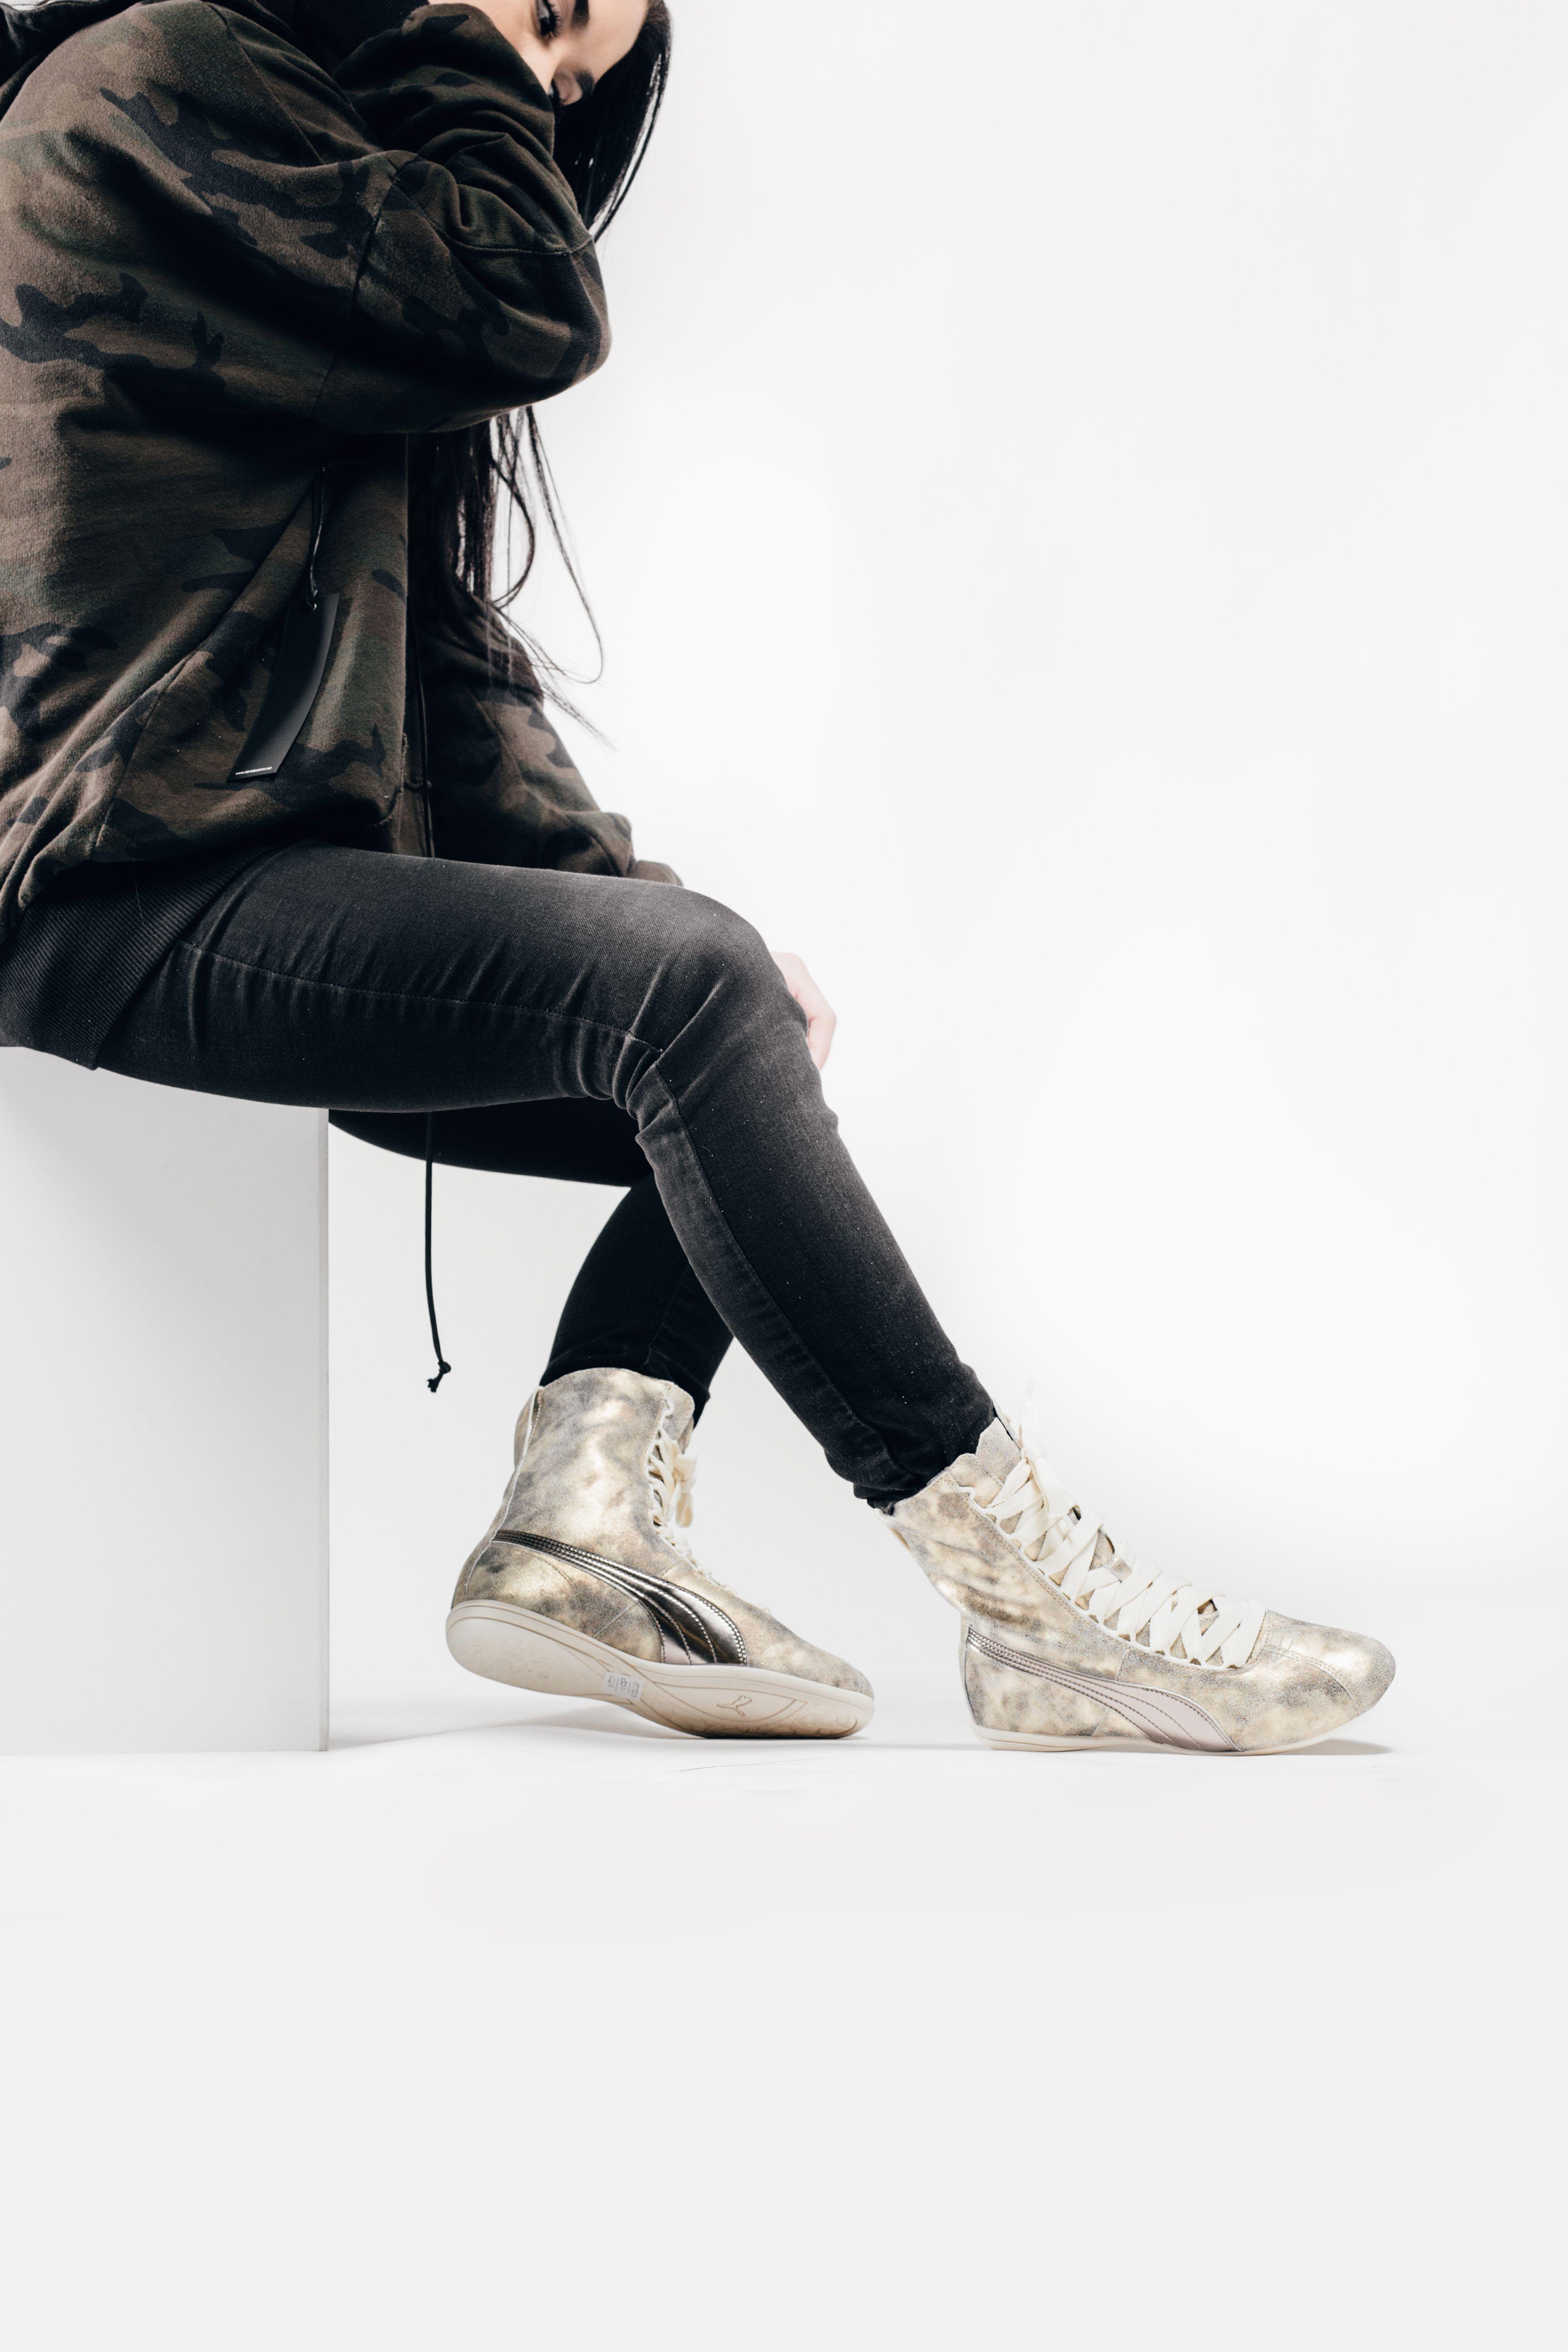 Puma x Rihanna Women s Eskiva Hi In Metallic Gold  Puma  Rihanna  Eskiva   Fashion  Streetwear  Style  Urban  Lookbook  Photography  Footwear   Sneakers ... c3a7d8cfa